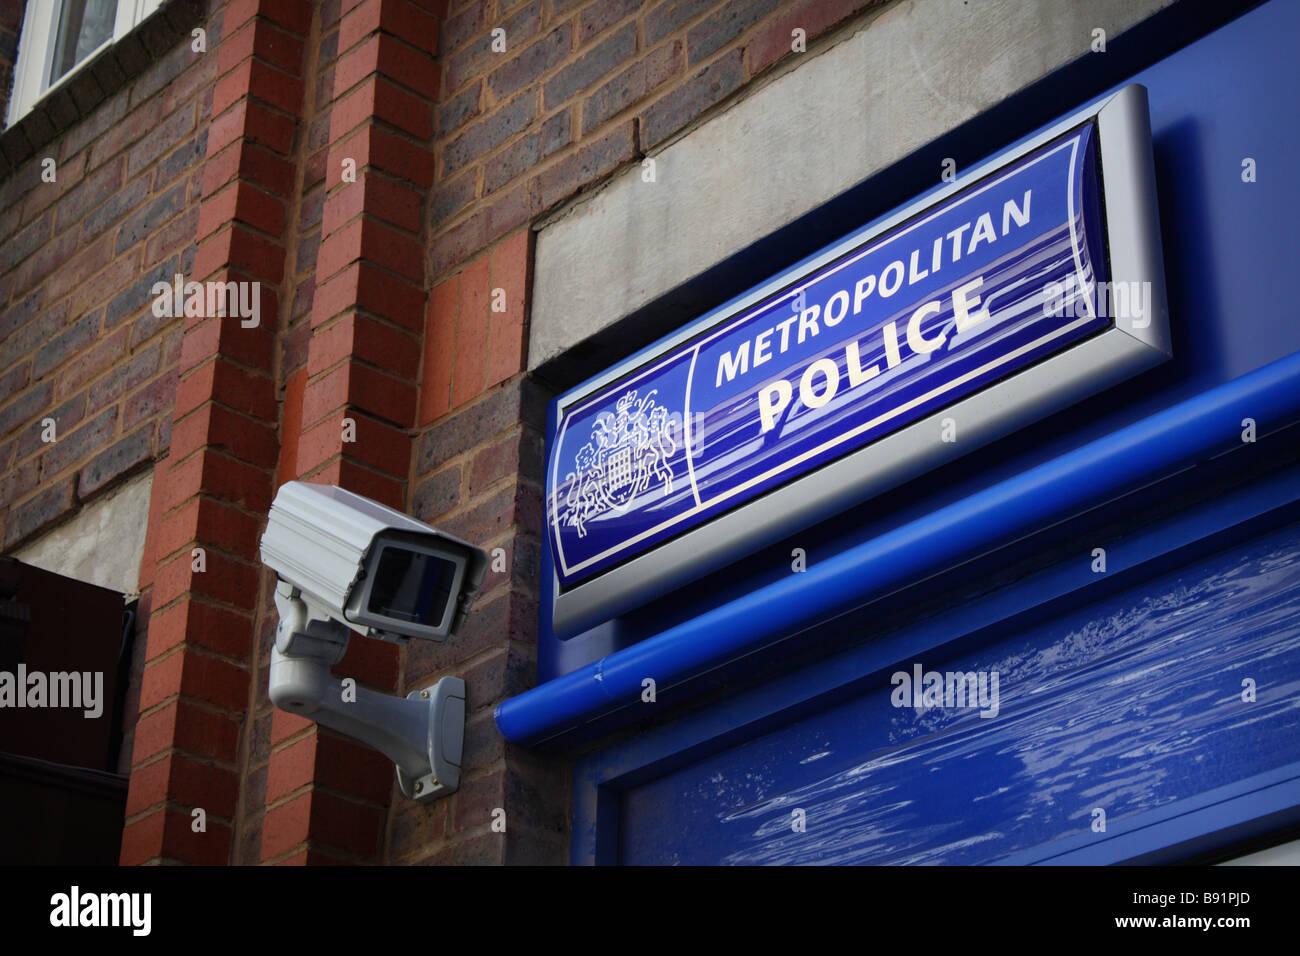 Metropolitan police surveillance camera and sign. - Stock Image